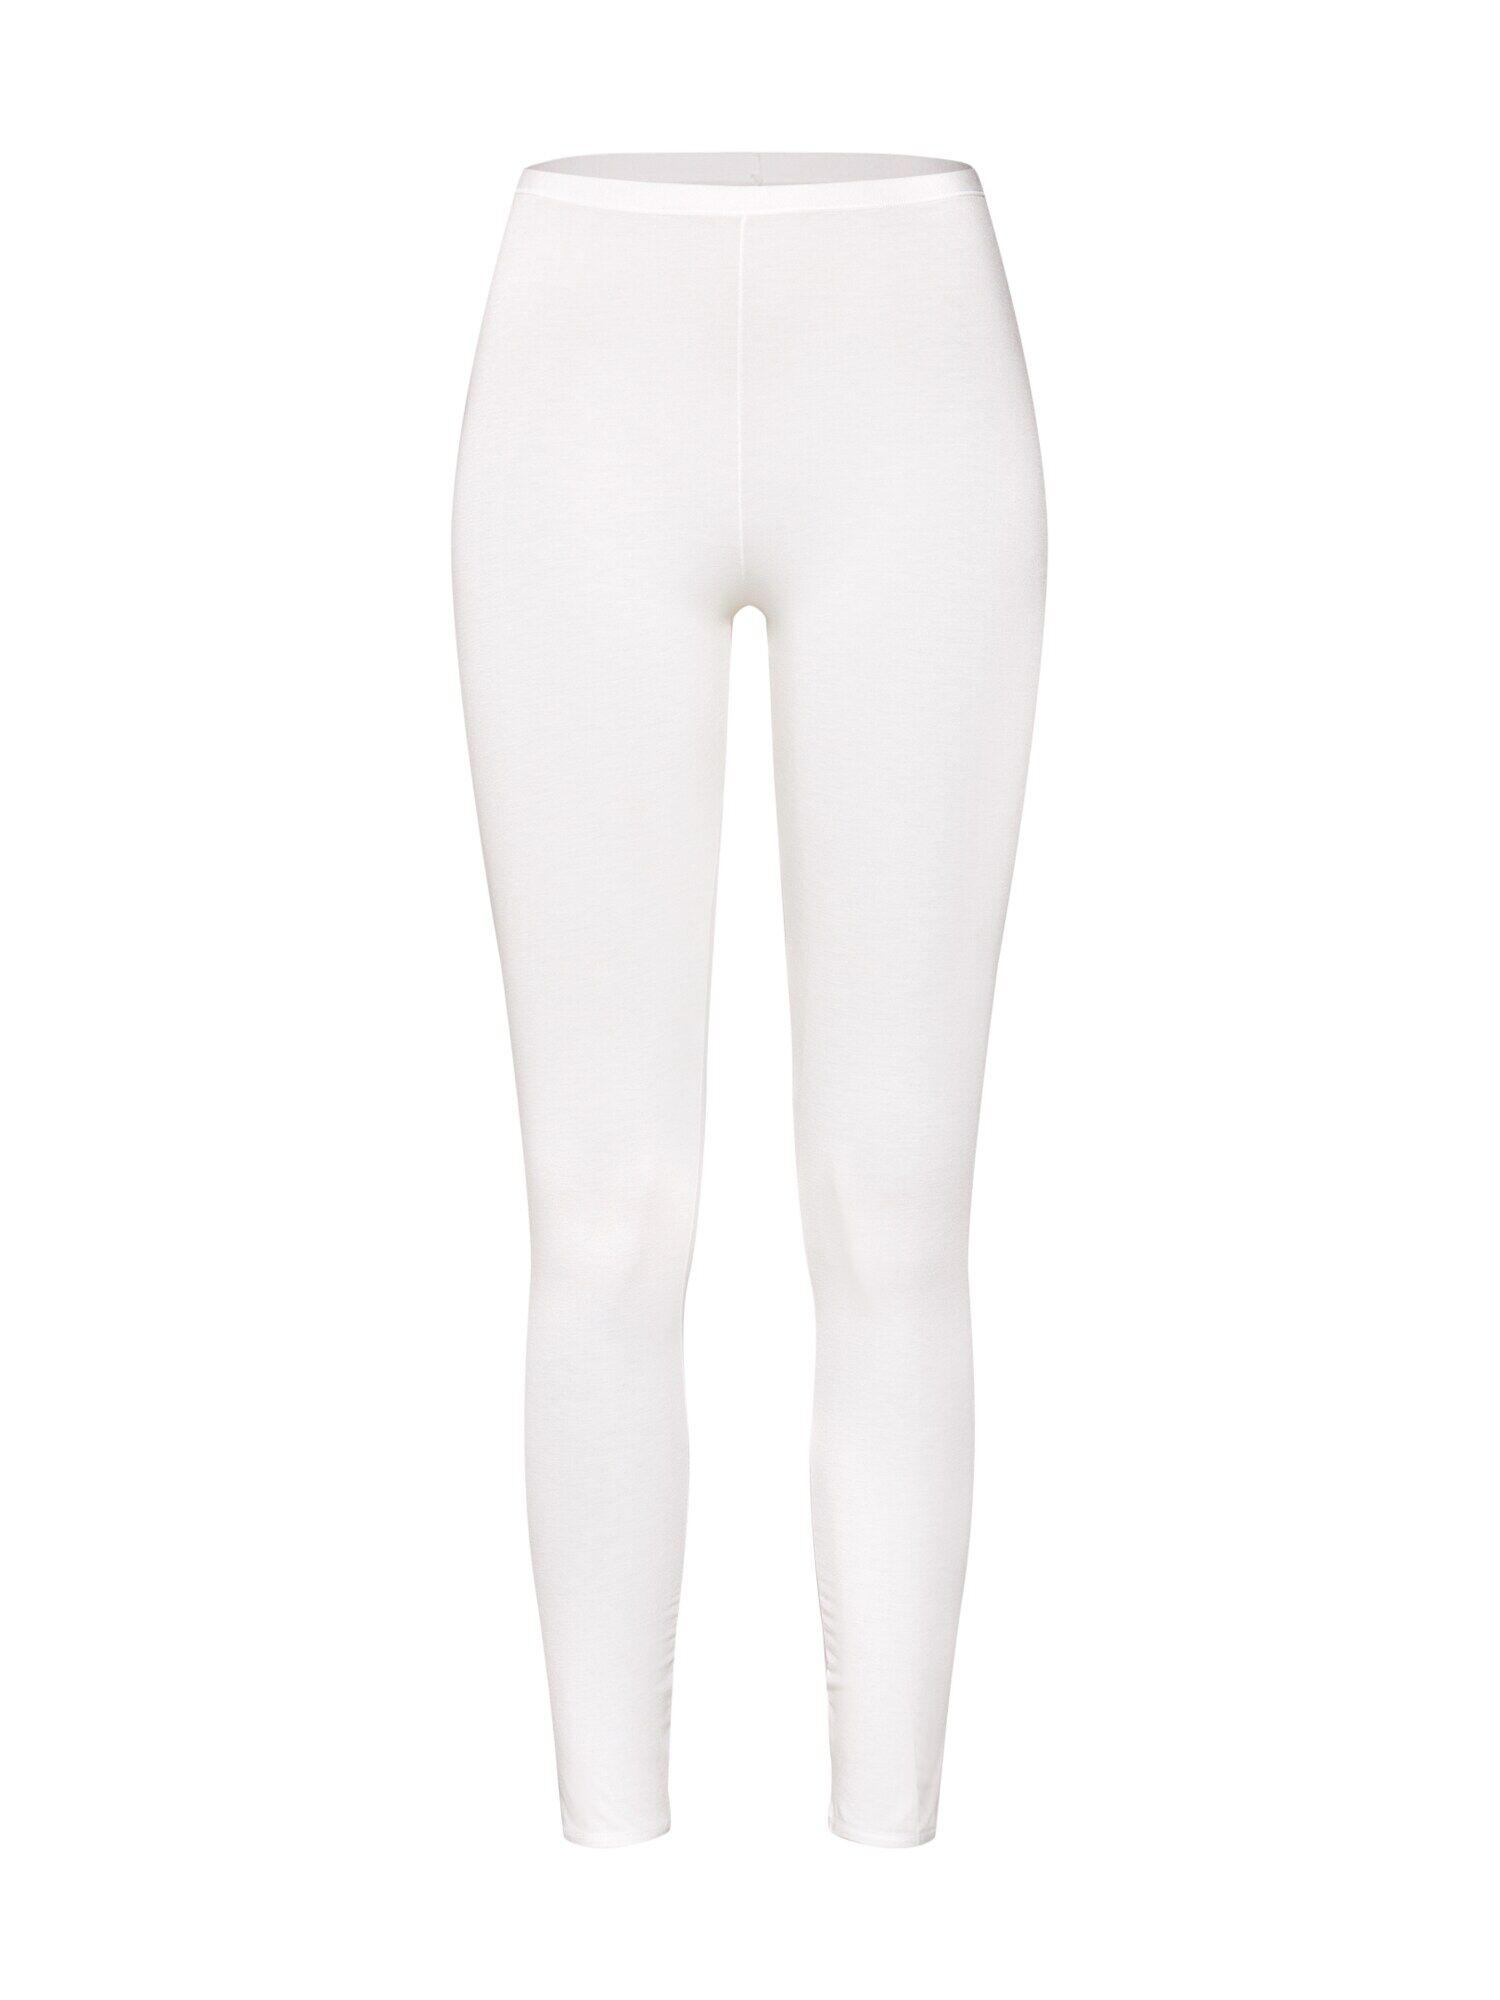 SCHIESSER Pantalon de pyjama 'Personal Fit'  - Blanc - Taille: M - female